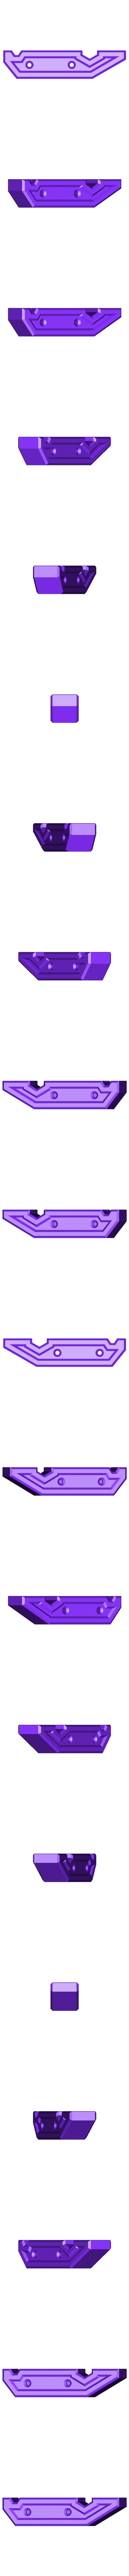 Head.stl Download STL file Monkey wrench fidget toy • 3D print design, glargonoid